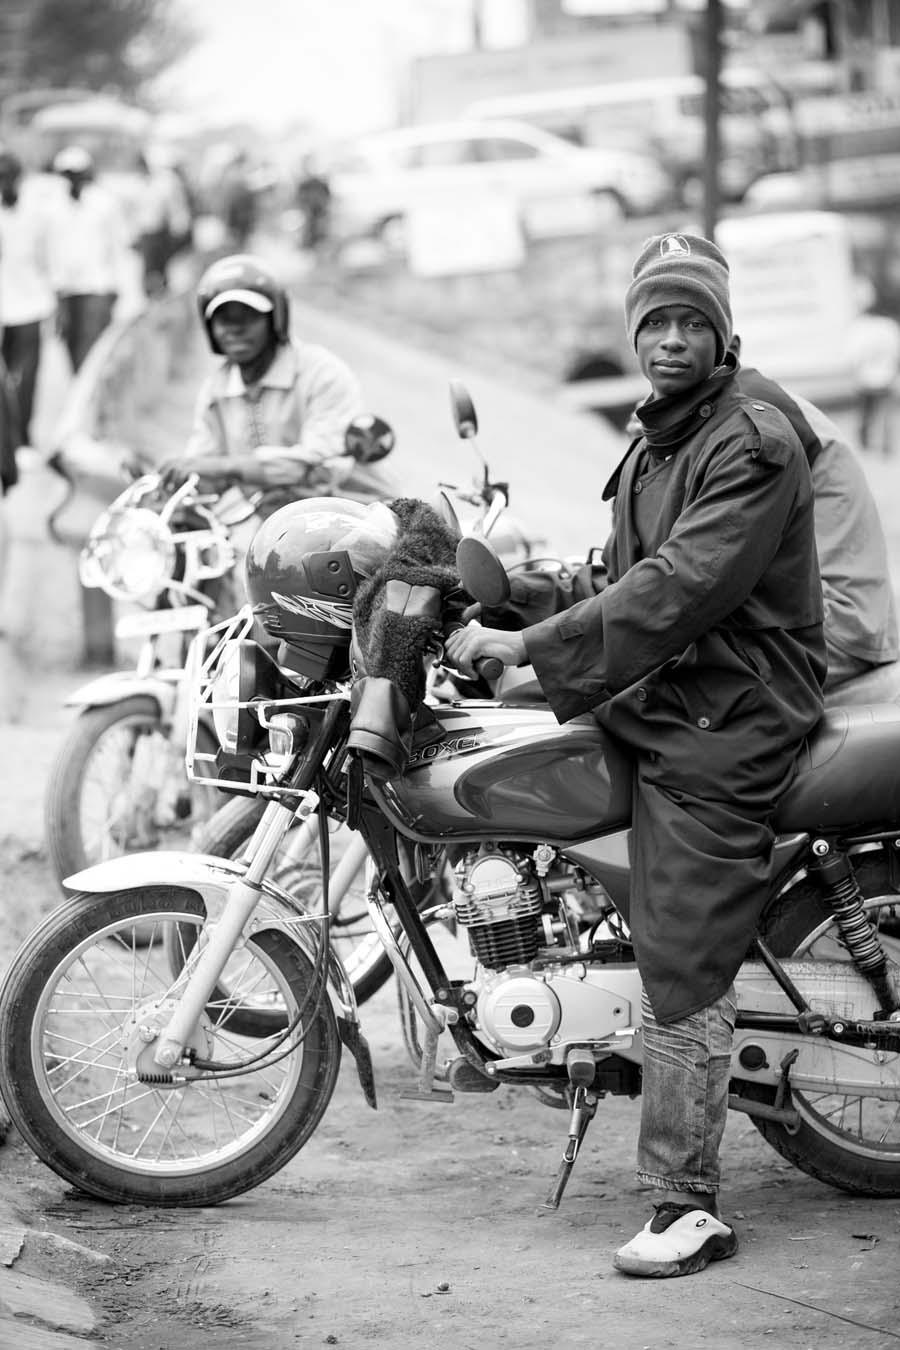 jessicadavisphotography.com | Jessica Davis Photography | Portrait Work in Uganda| Travel Photographer | World Event Photographs 2 (6).jpg